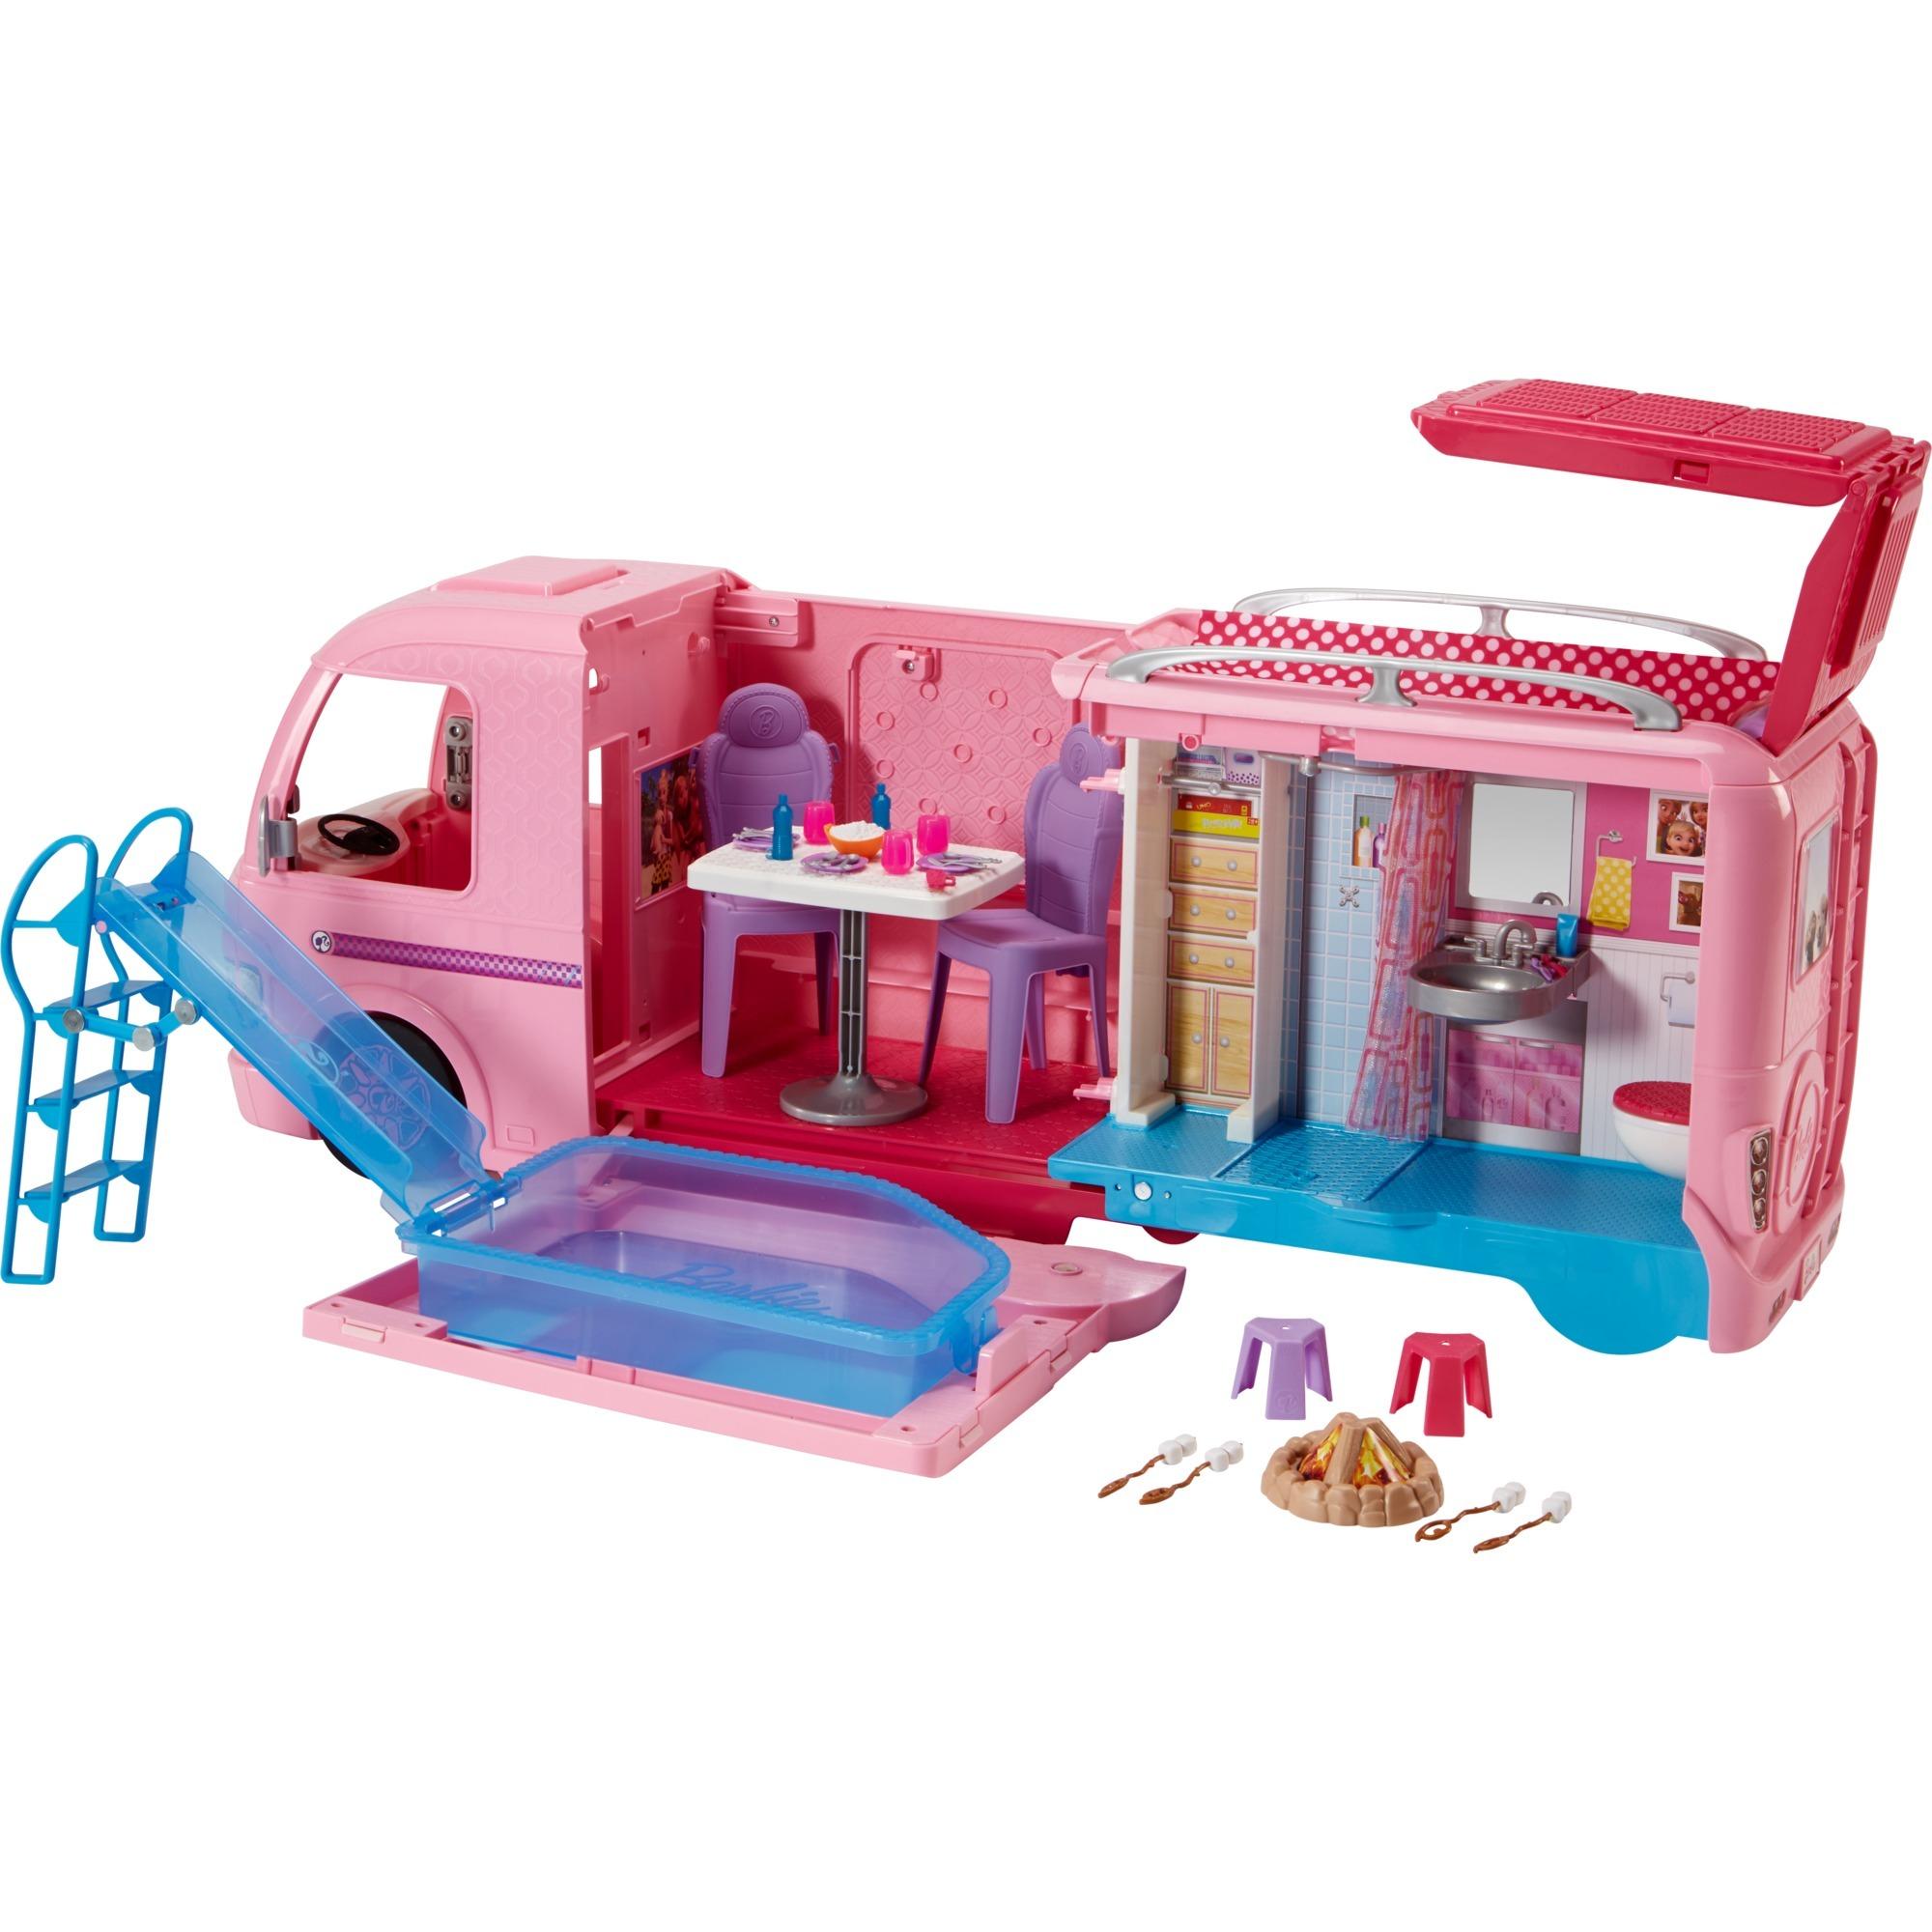 Barbie - Supercaravana de Barbie